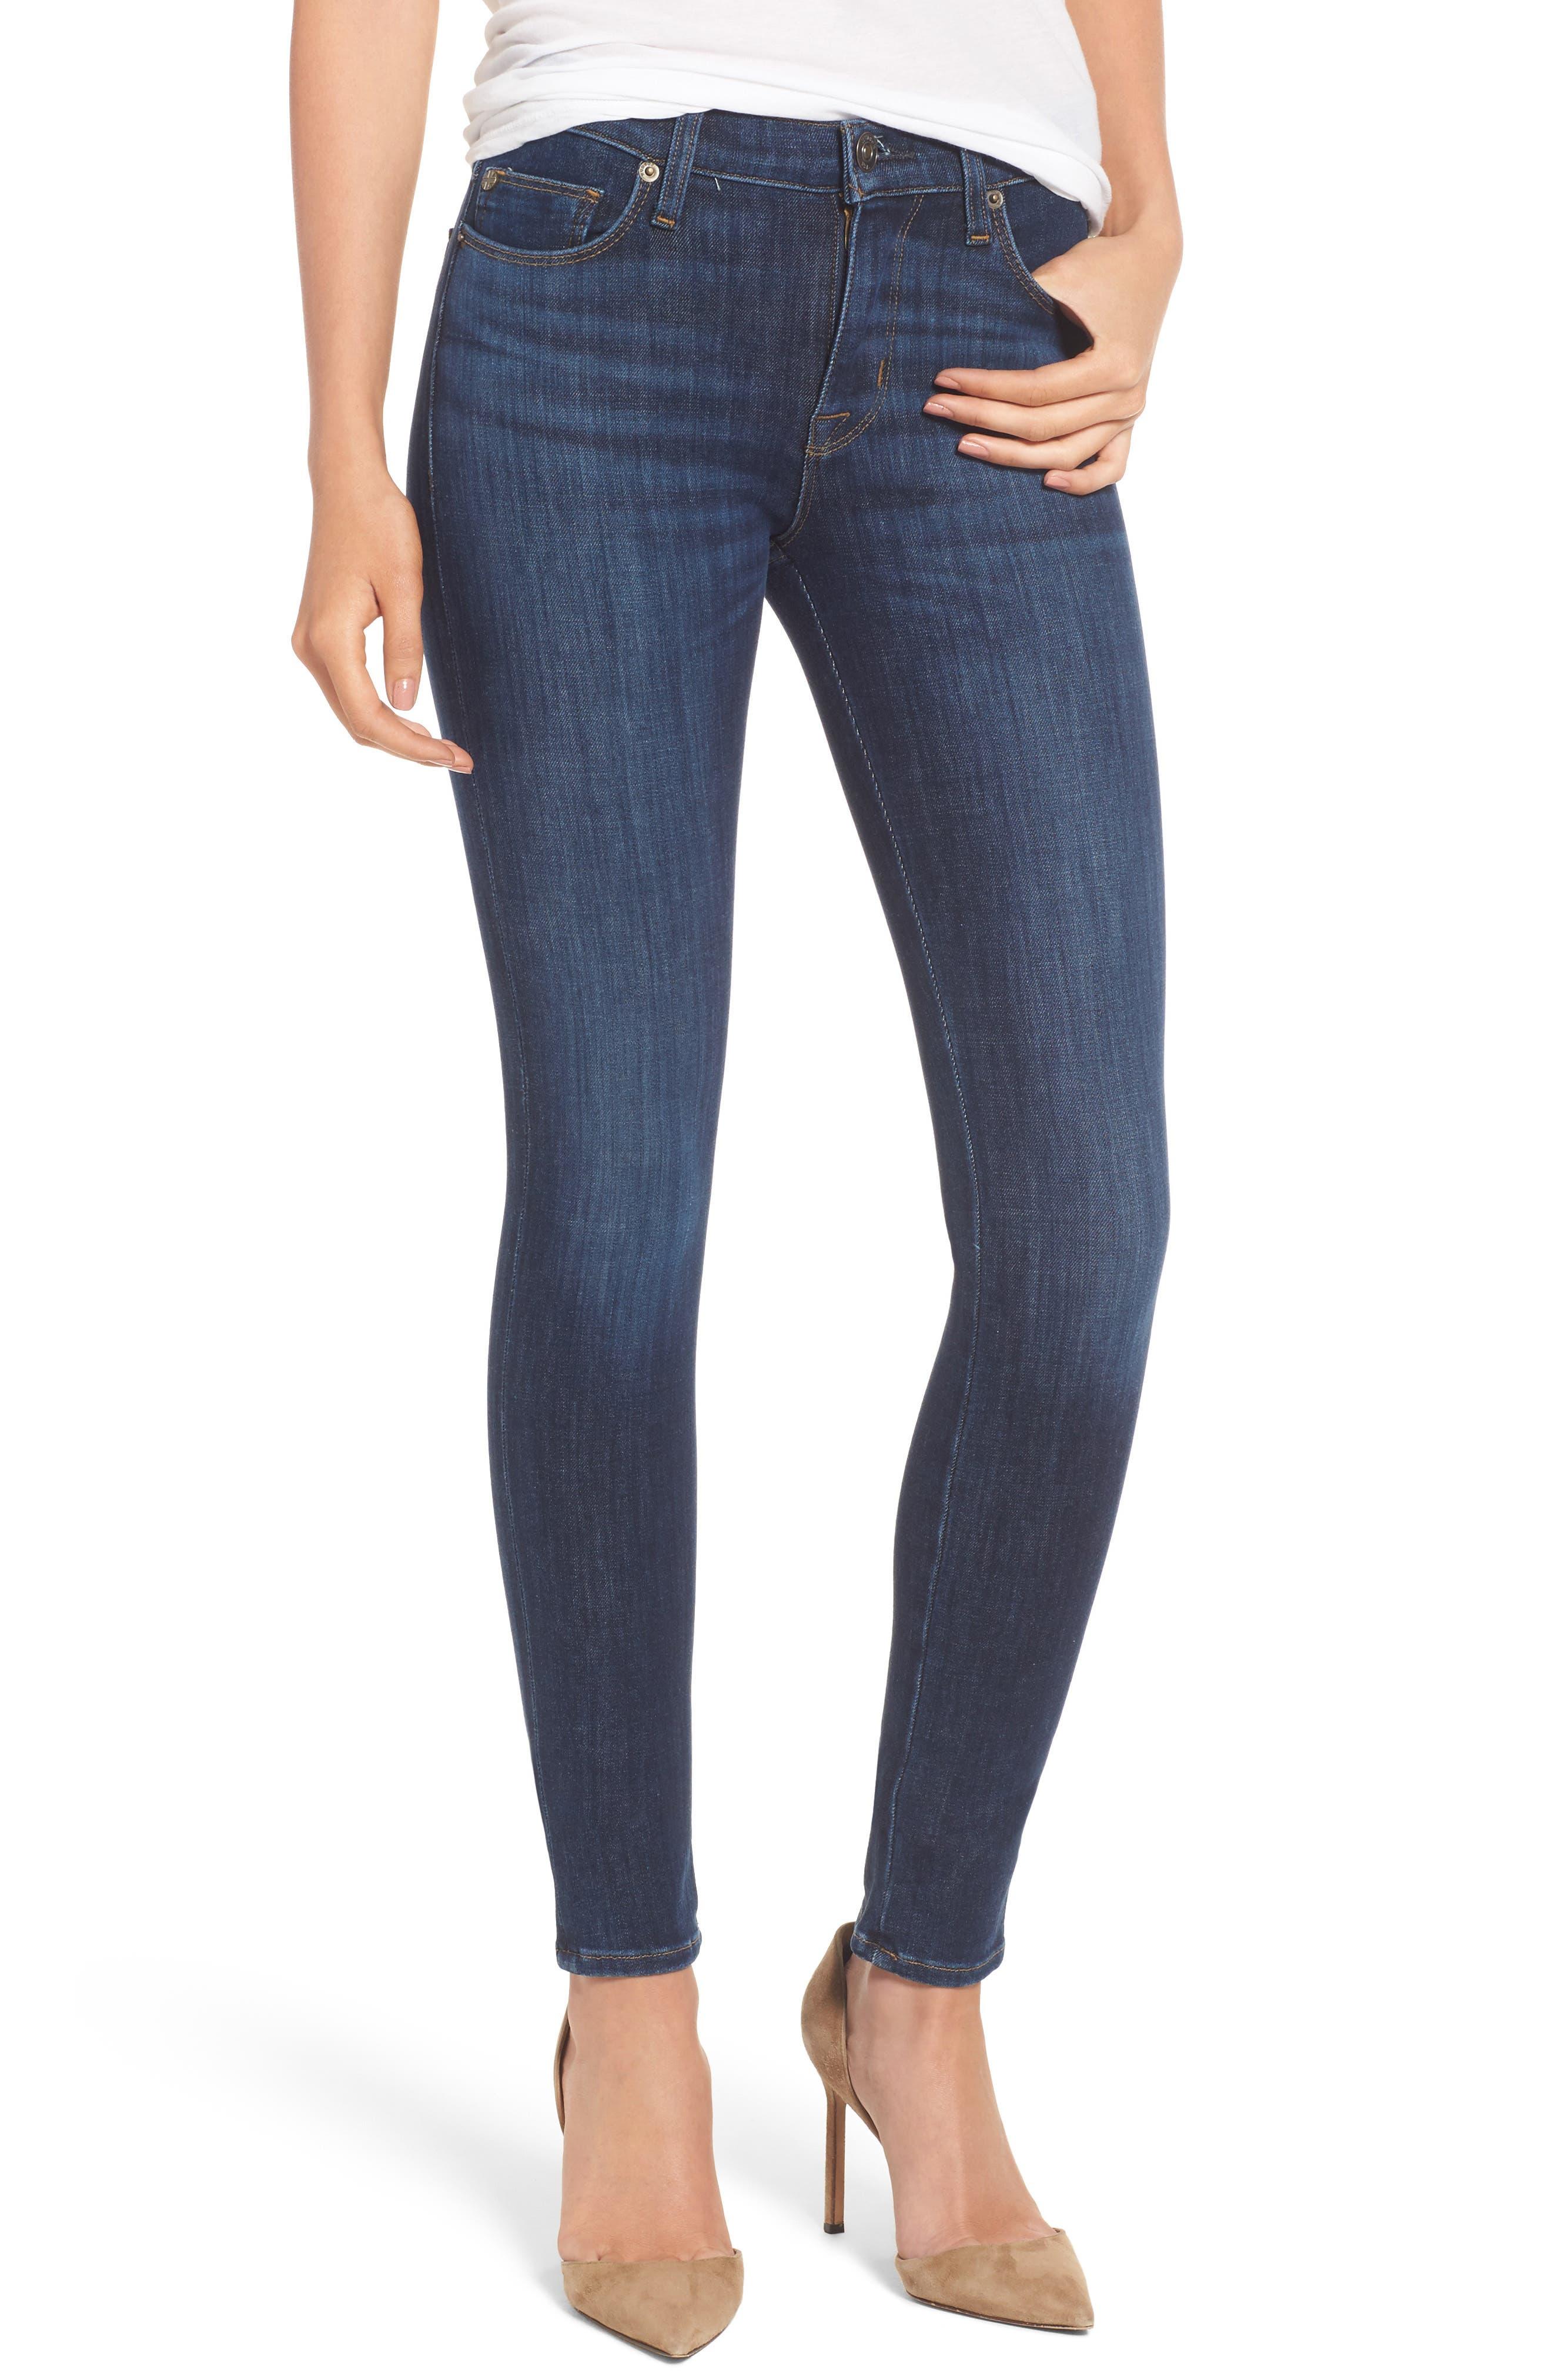 Alternate Image 1 Selected - Hudson Jeans Nico Super Skinny Jeans